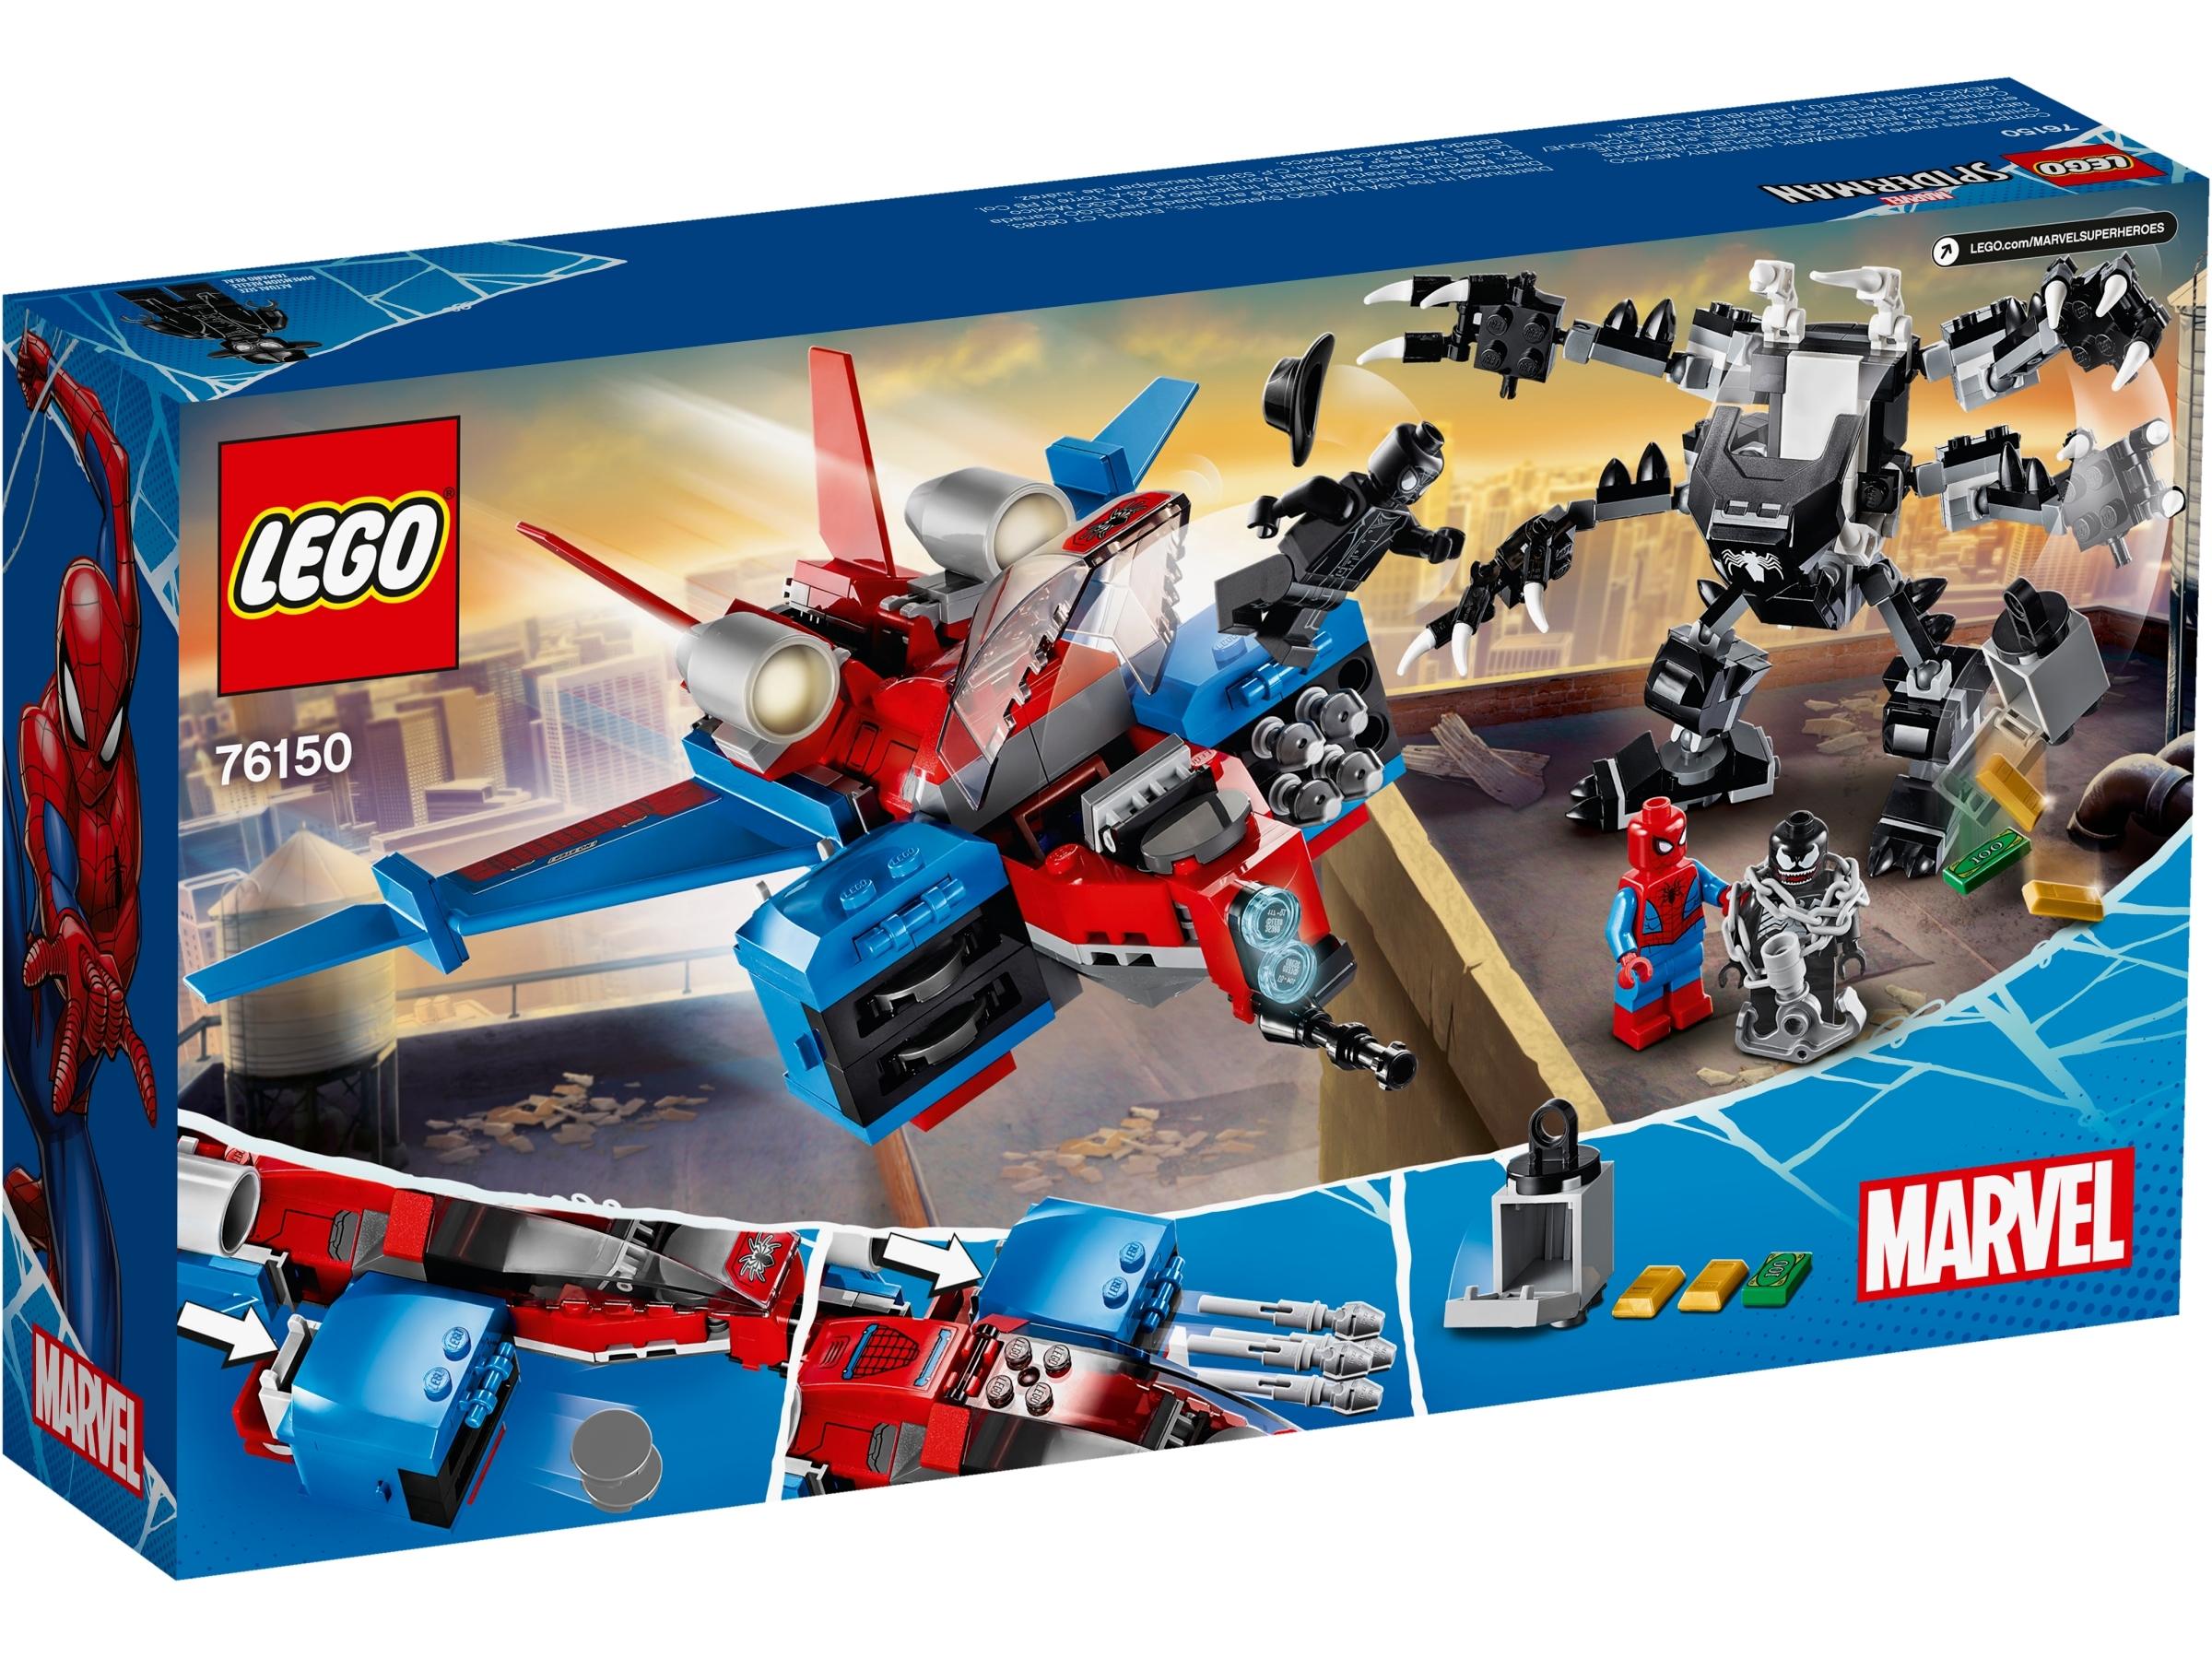 LEGO Marvel Spider-Man 76150 Spider-Man Jet vs Venom Mech Damaged Box